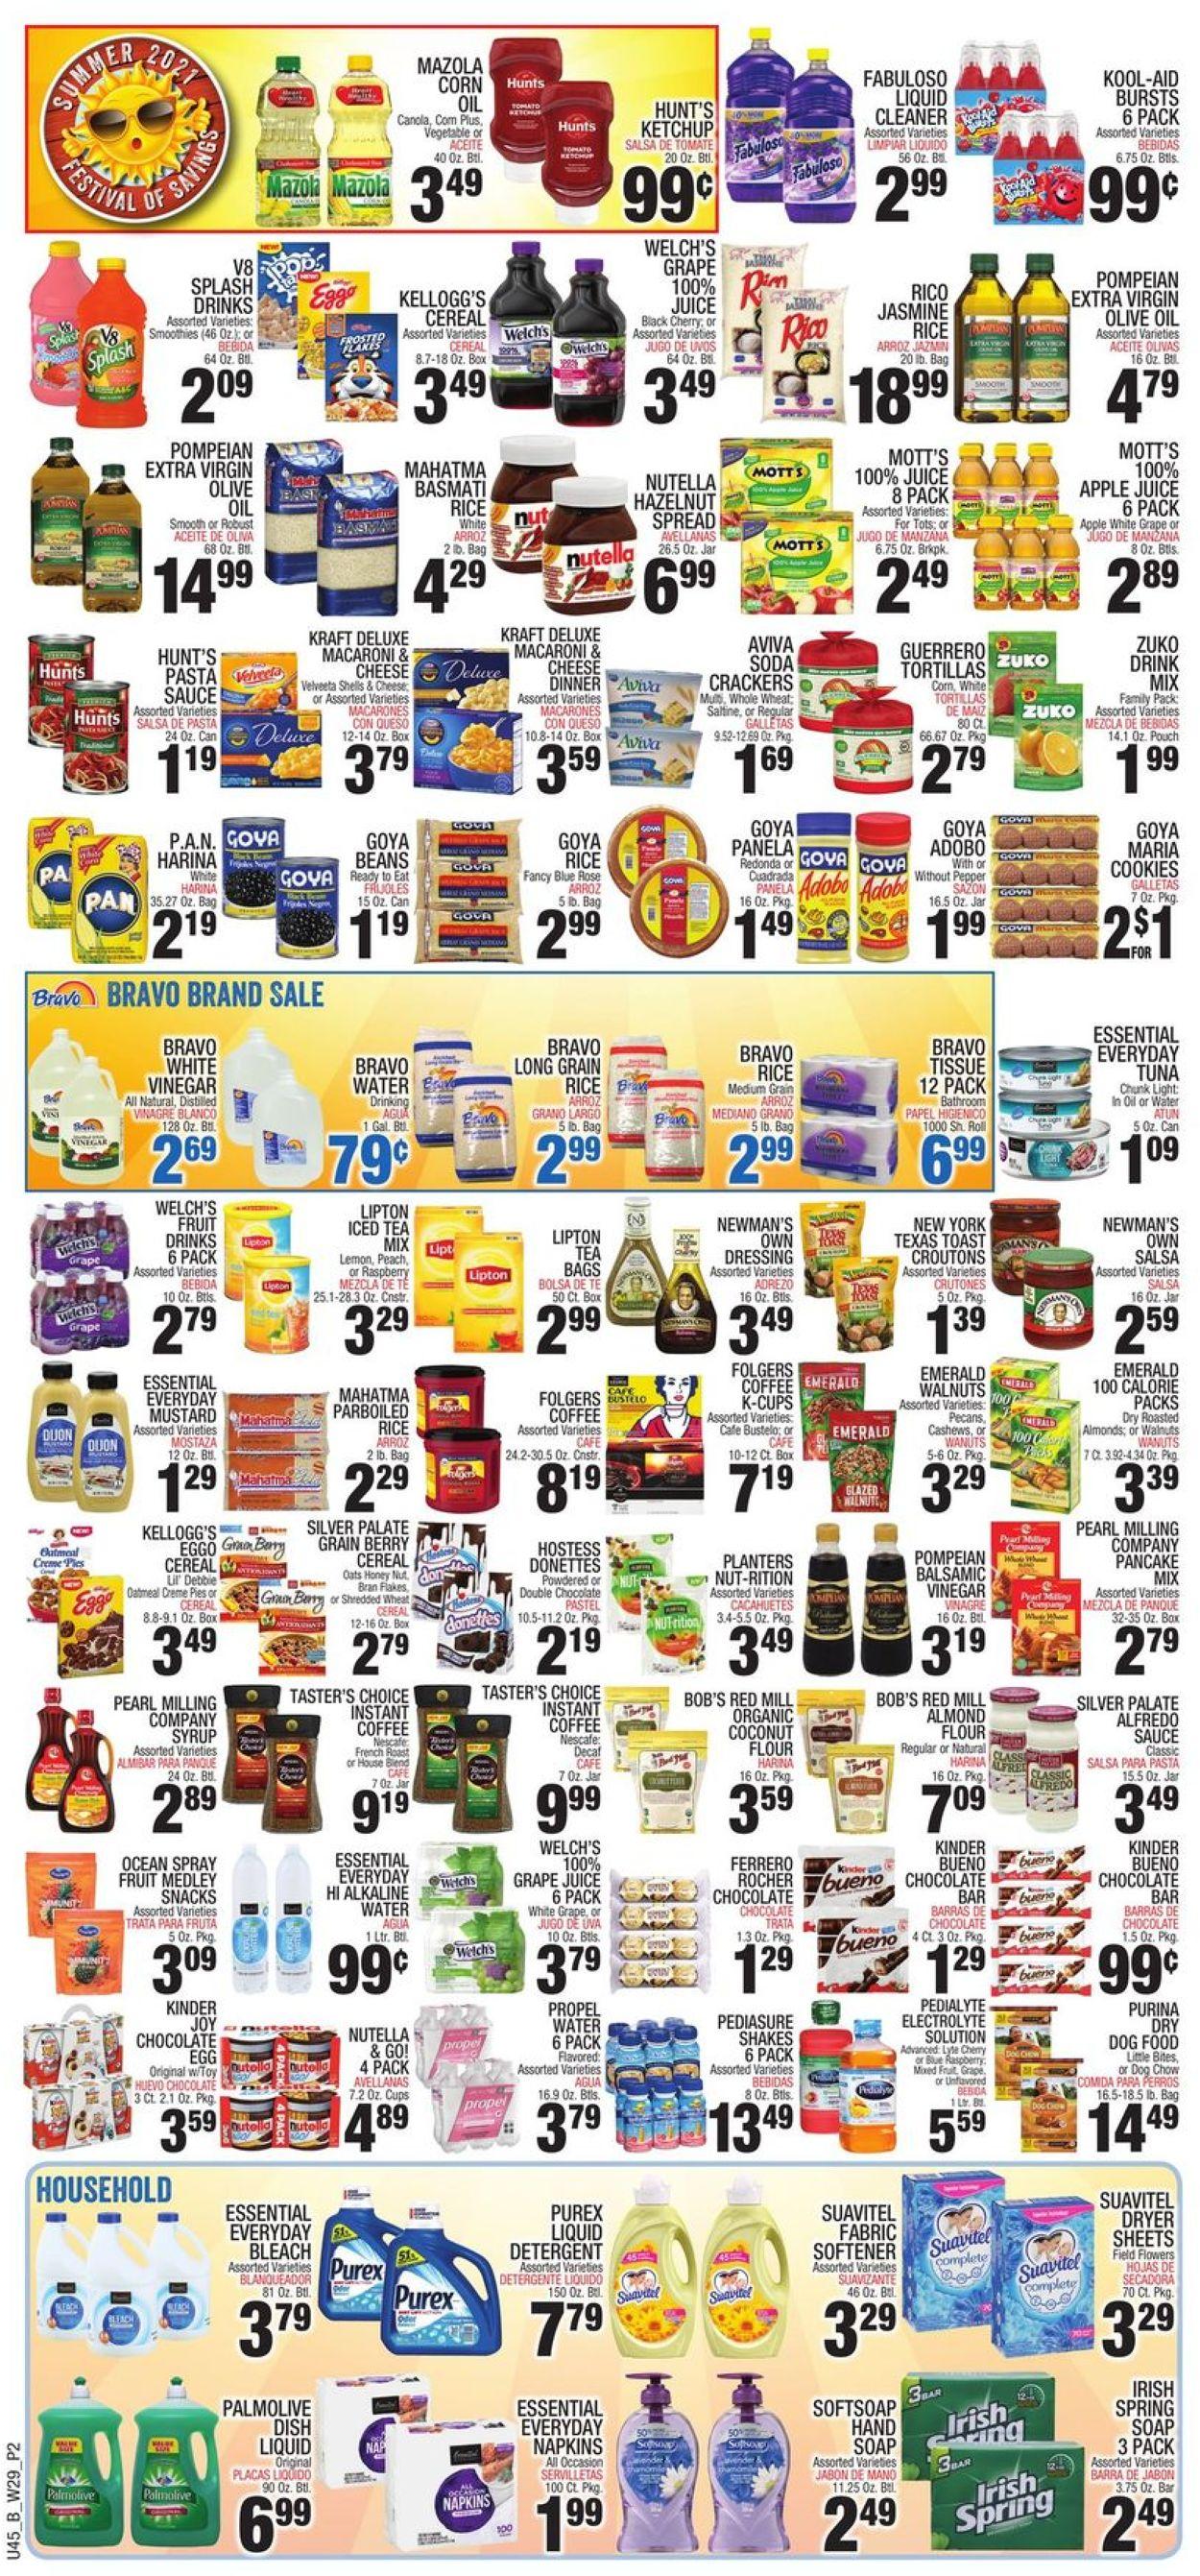 Bravo Supermarkets Weekly Ad Circular - valid 07/15-07/21/2021 (Page 2)